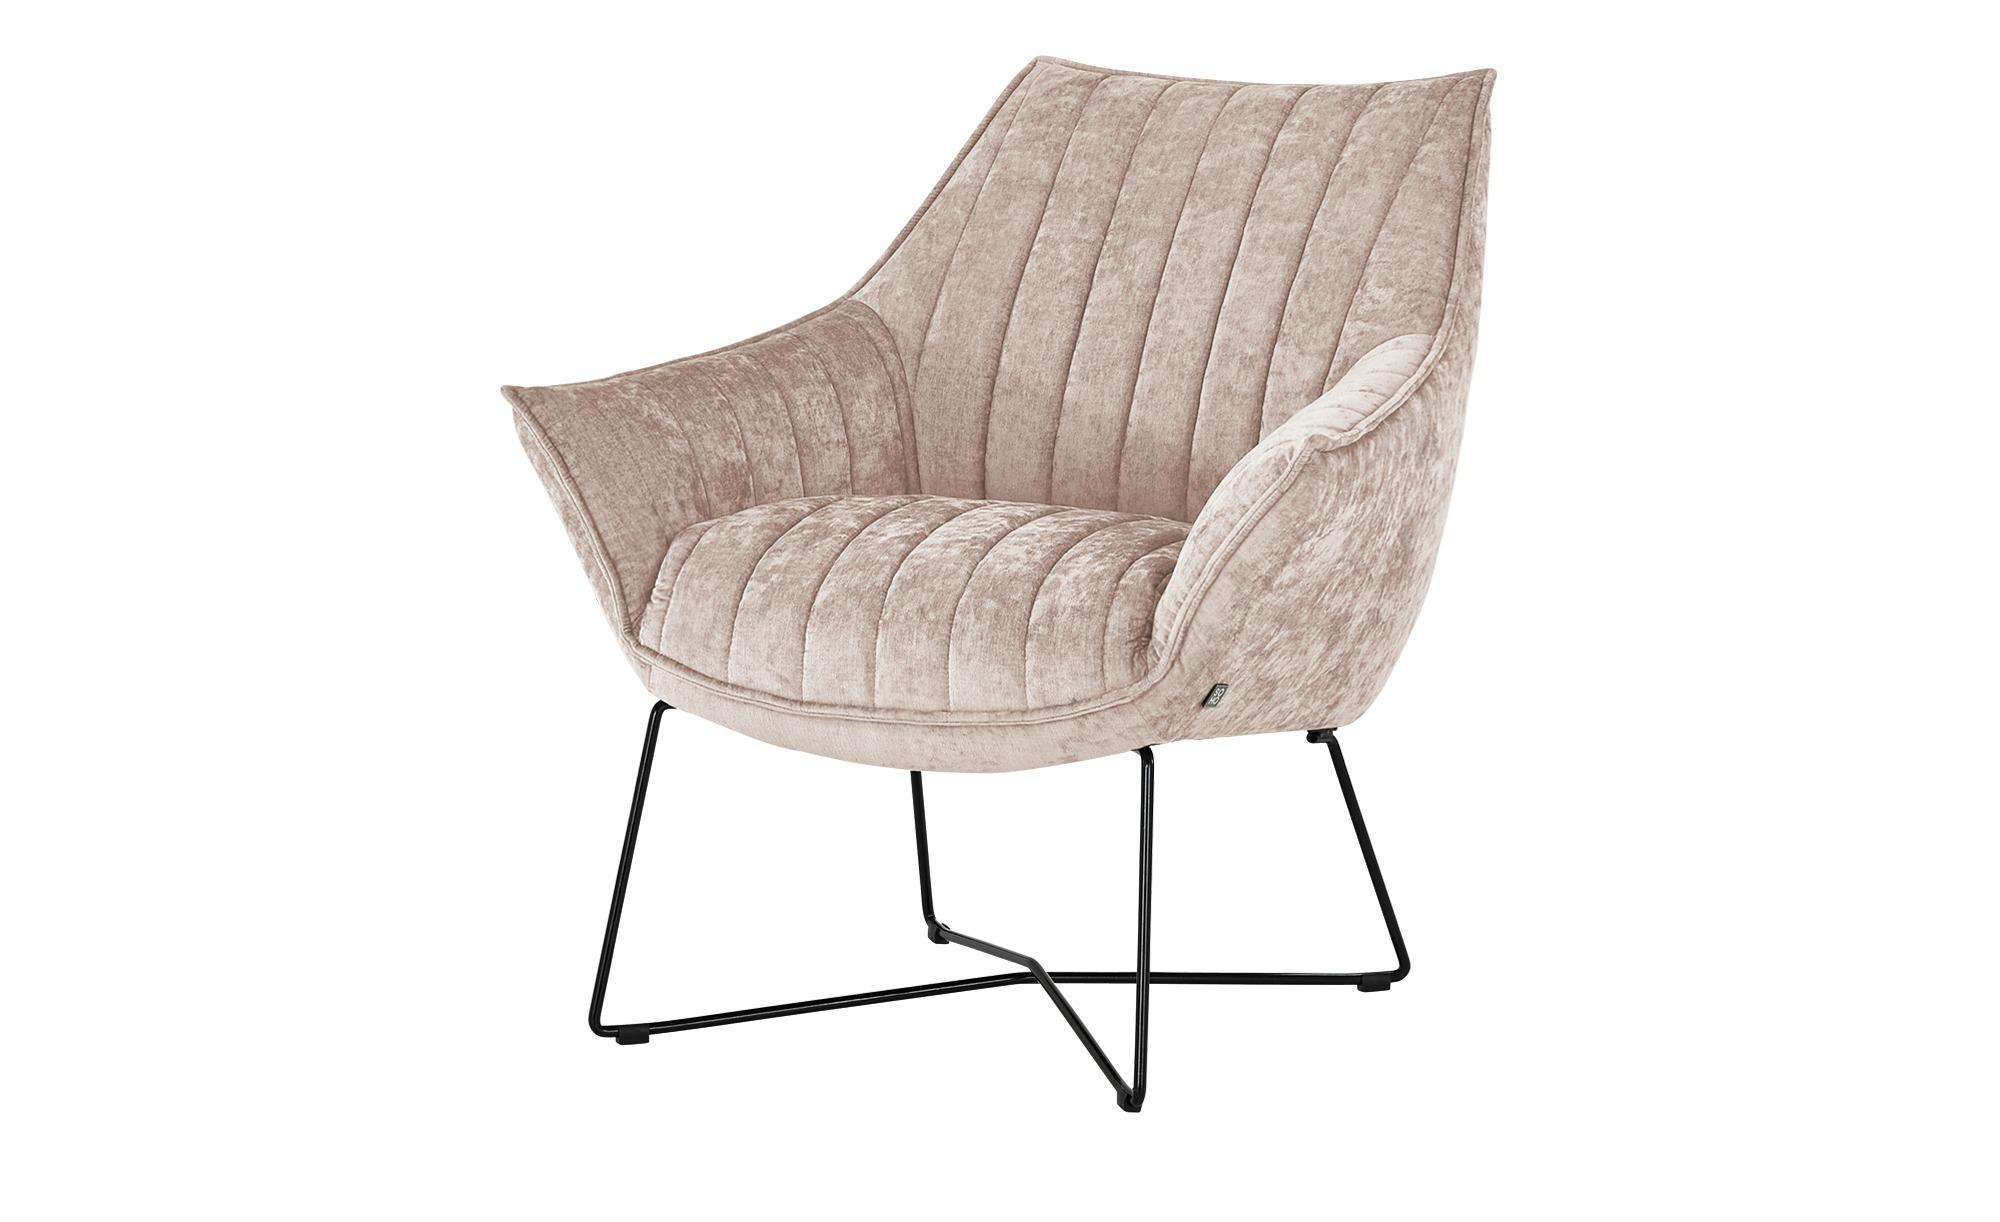 SOHO Sessel  Egeria ¦ rosa/pink ¦ Maße (cm): B: 86 H: 80 T: 83 Polstermöbel > Sessel > Polstersessel - Höffner